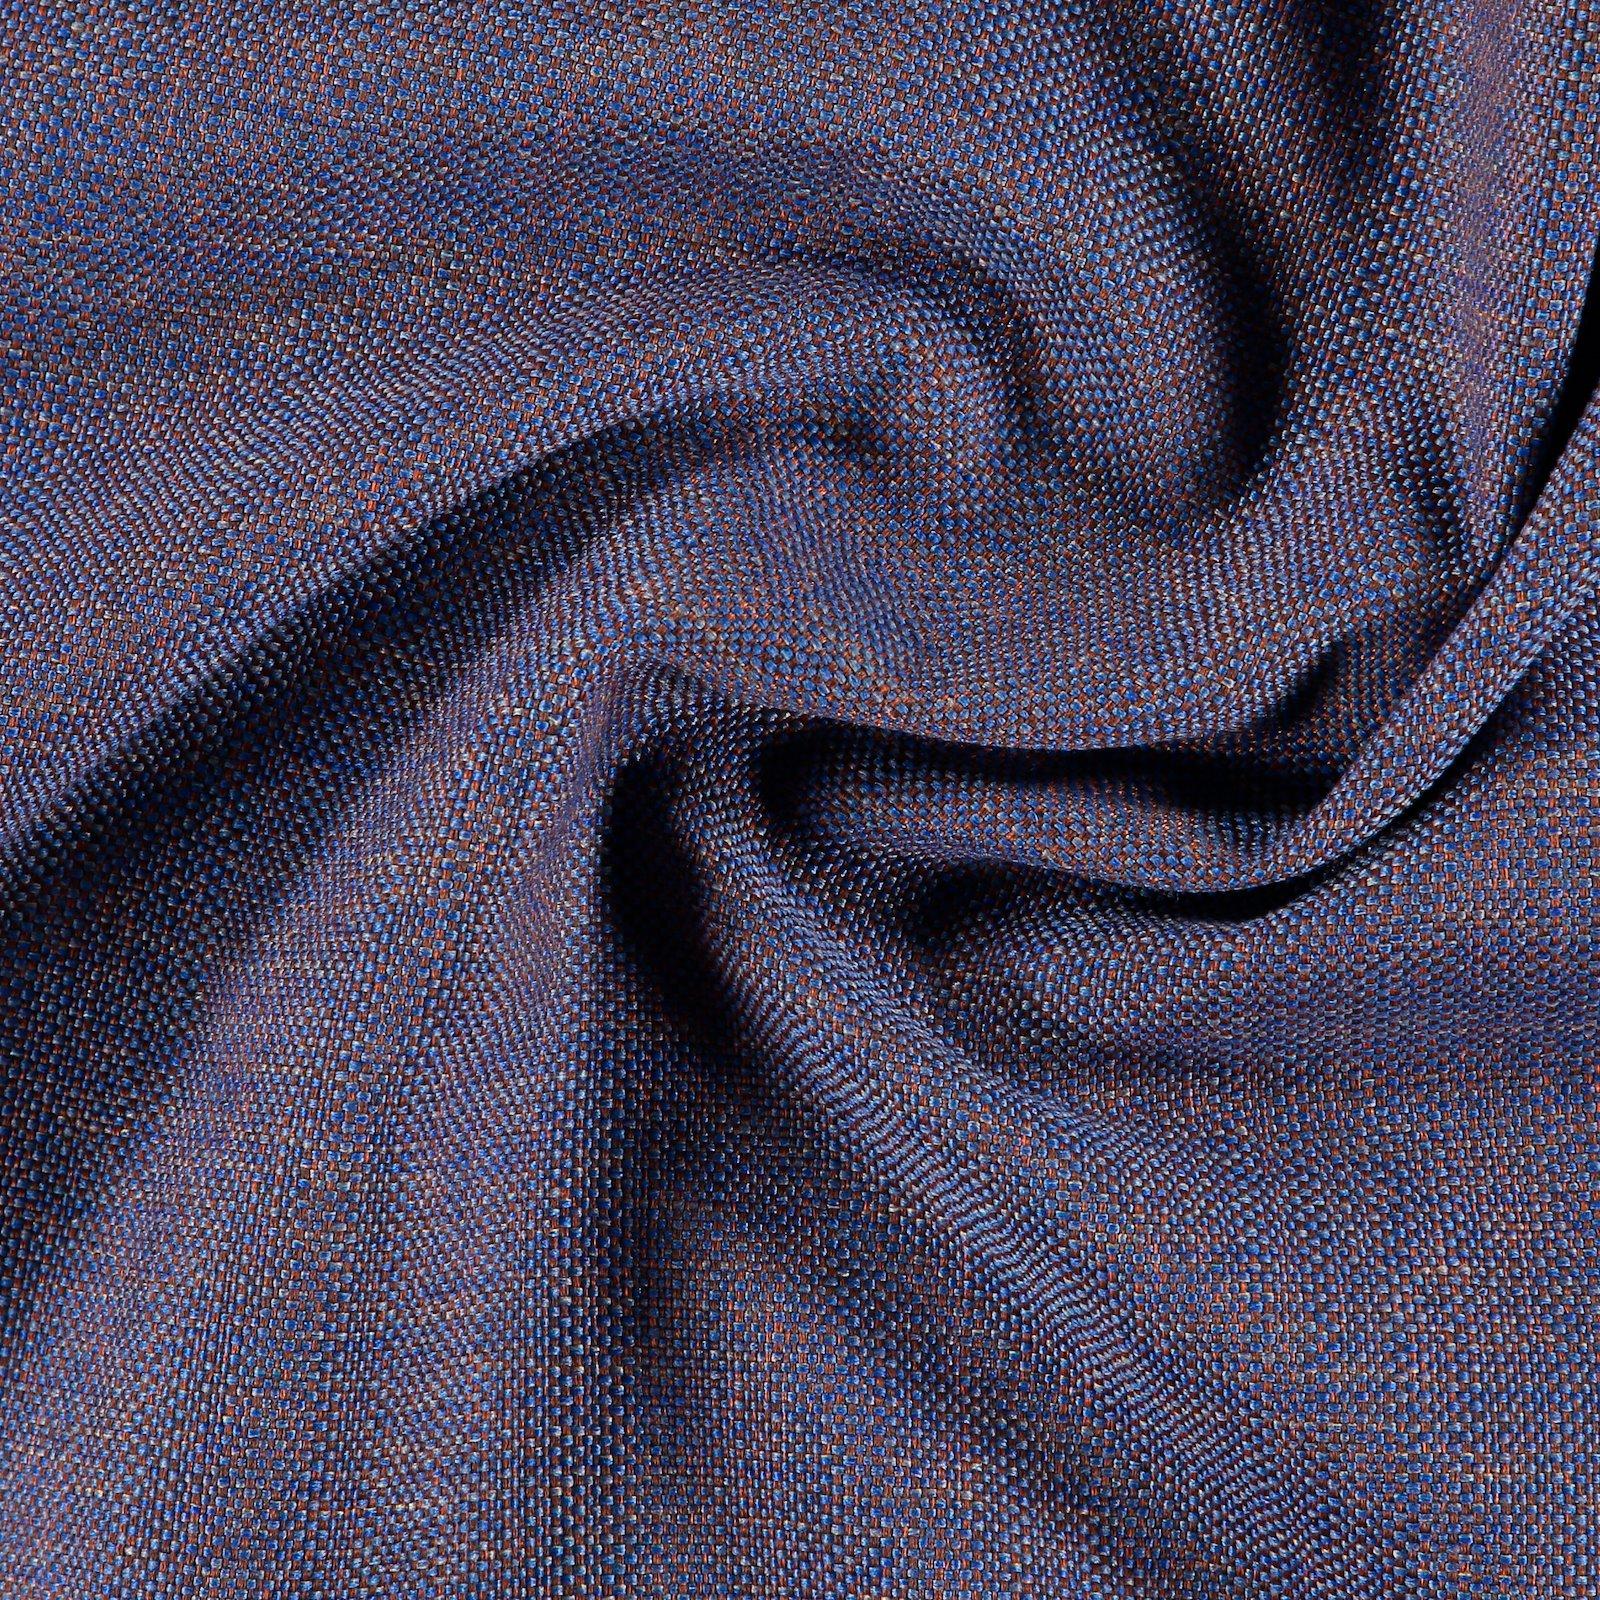 Upholstery fabric cobalt blue/caramel 824156_pack